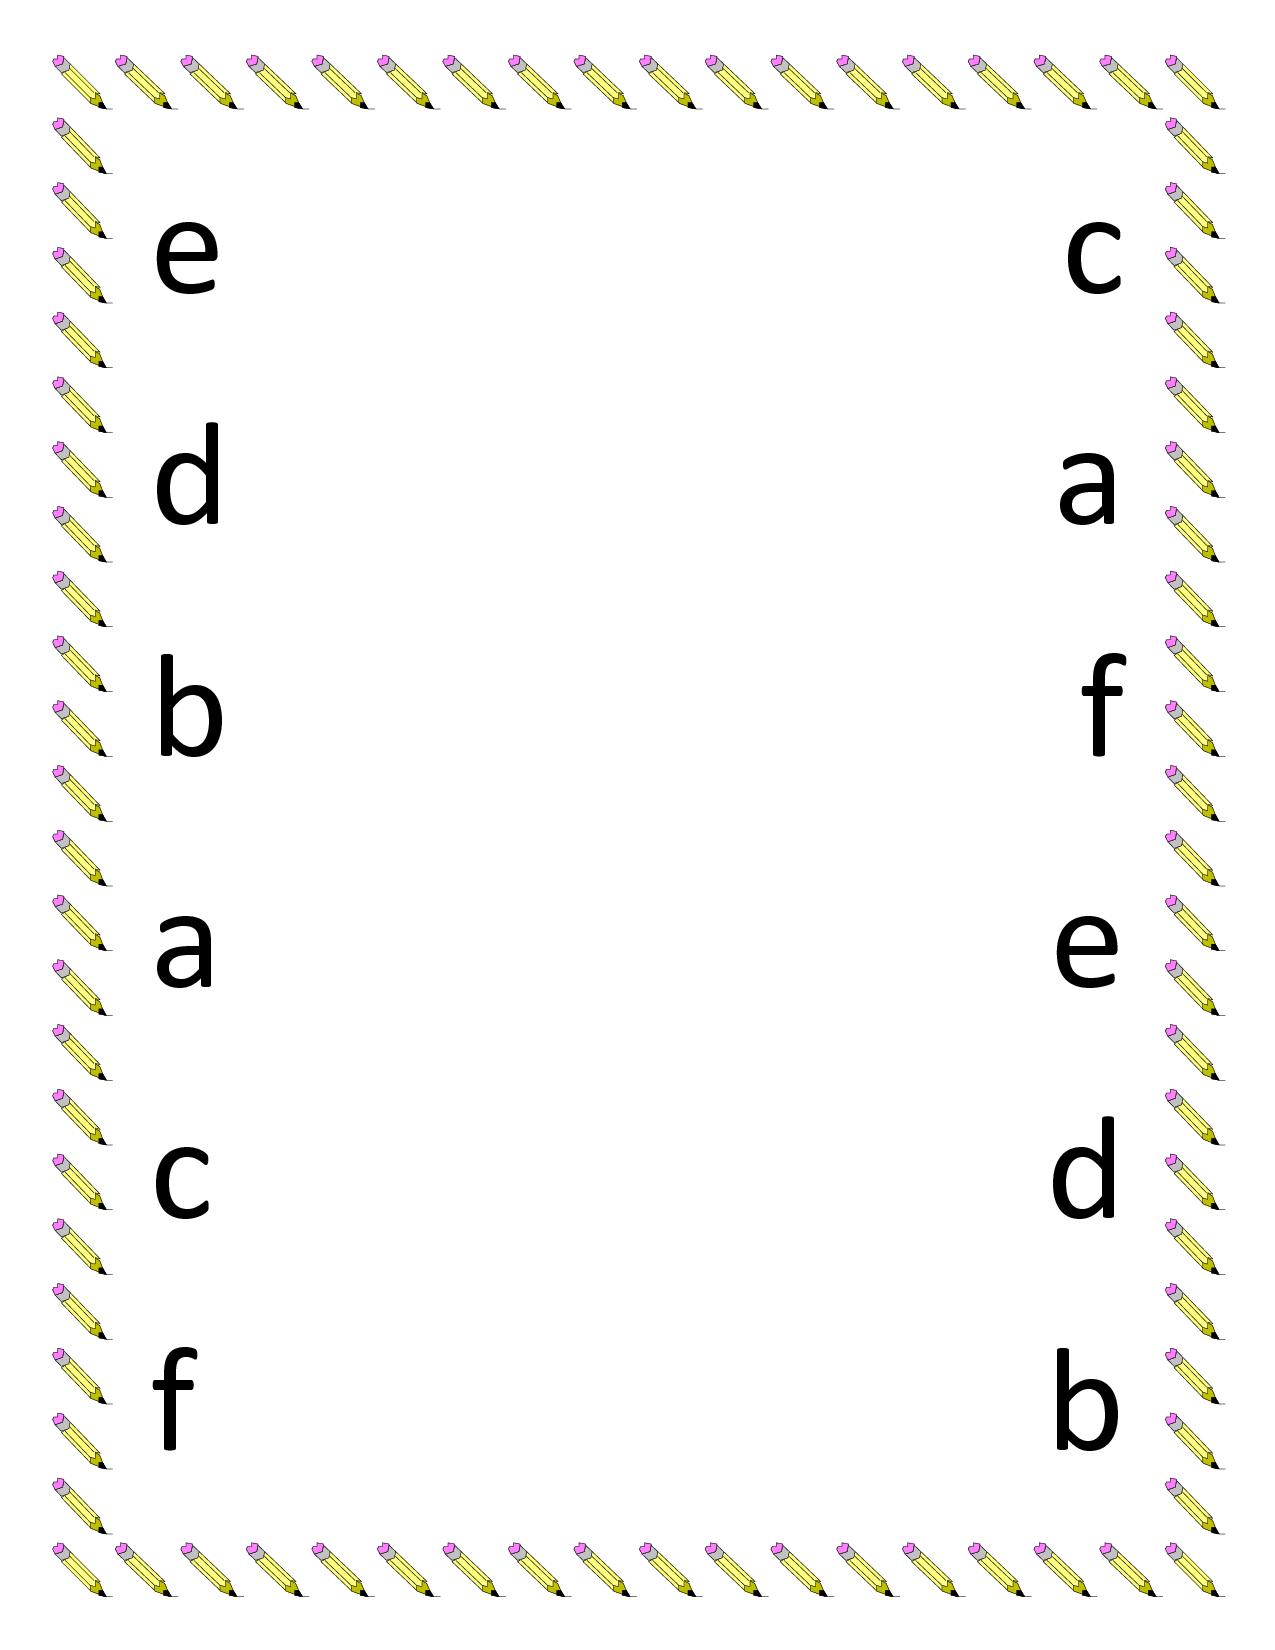 Preschool Science Worksheets Printables | Preschool Matching throughout Alphabet Matching Worksheets For Pre-K